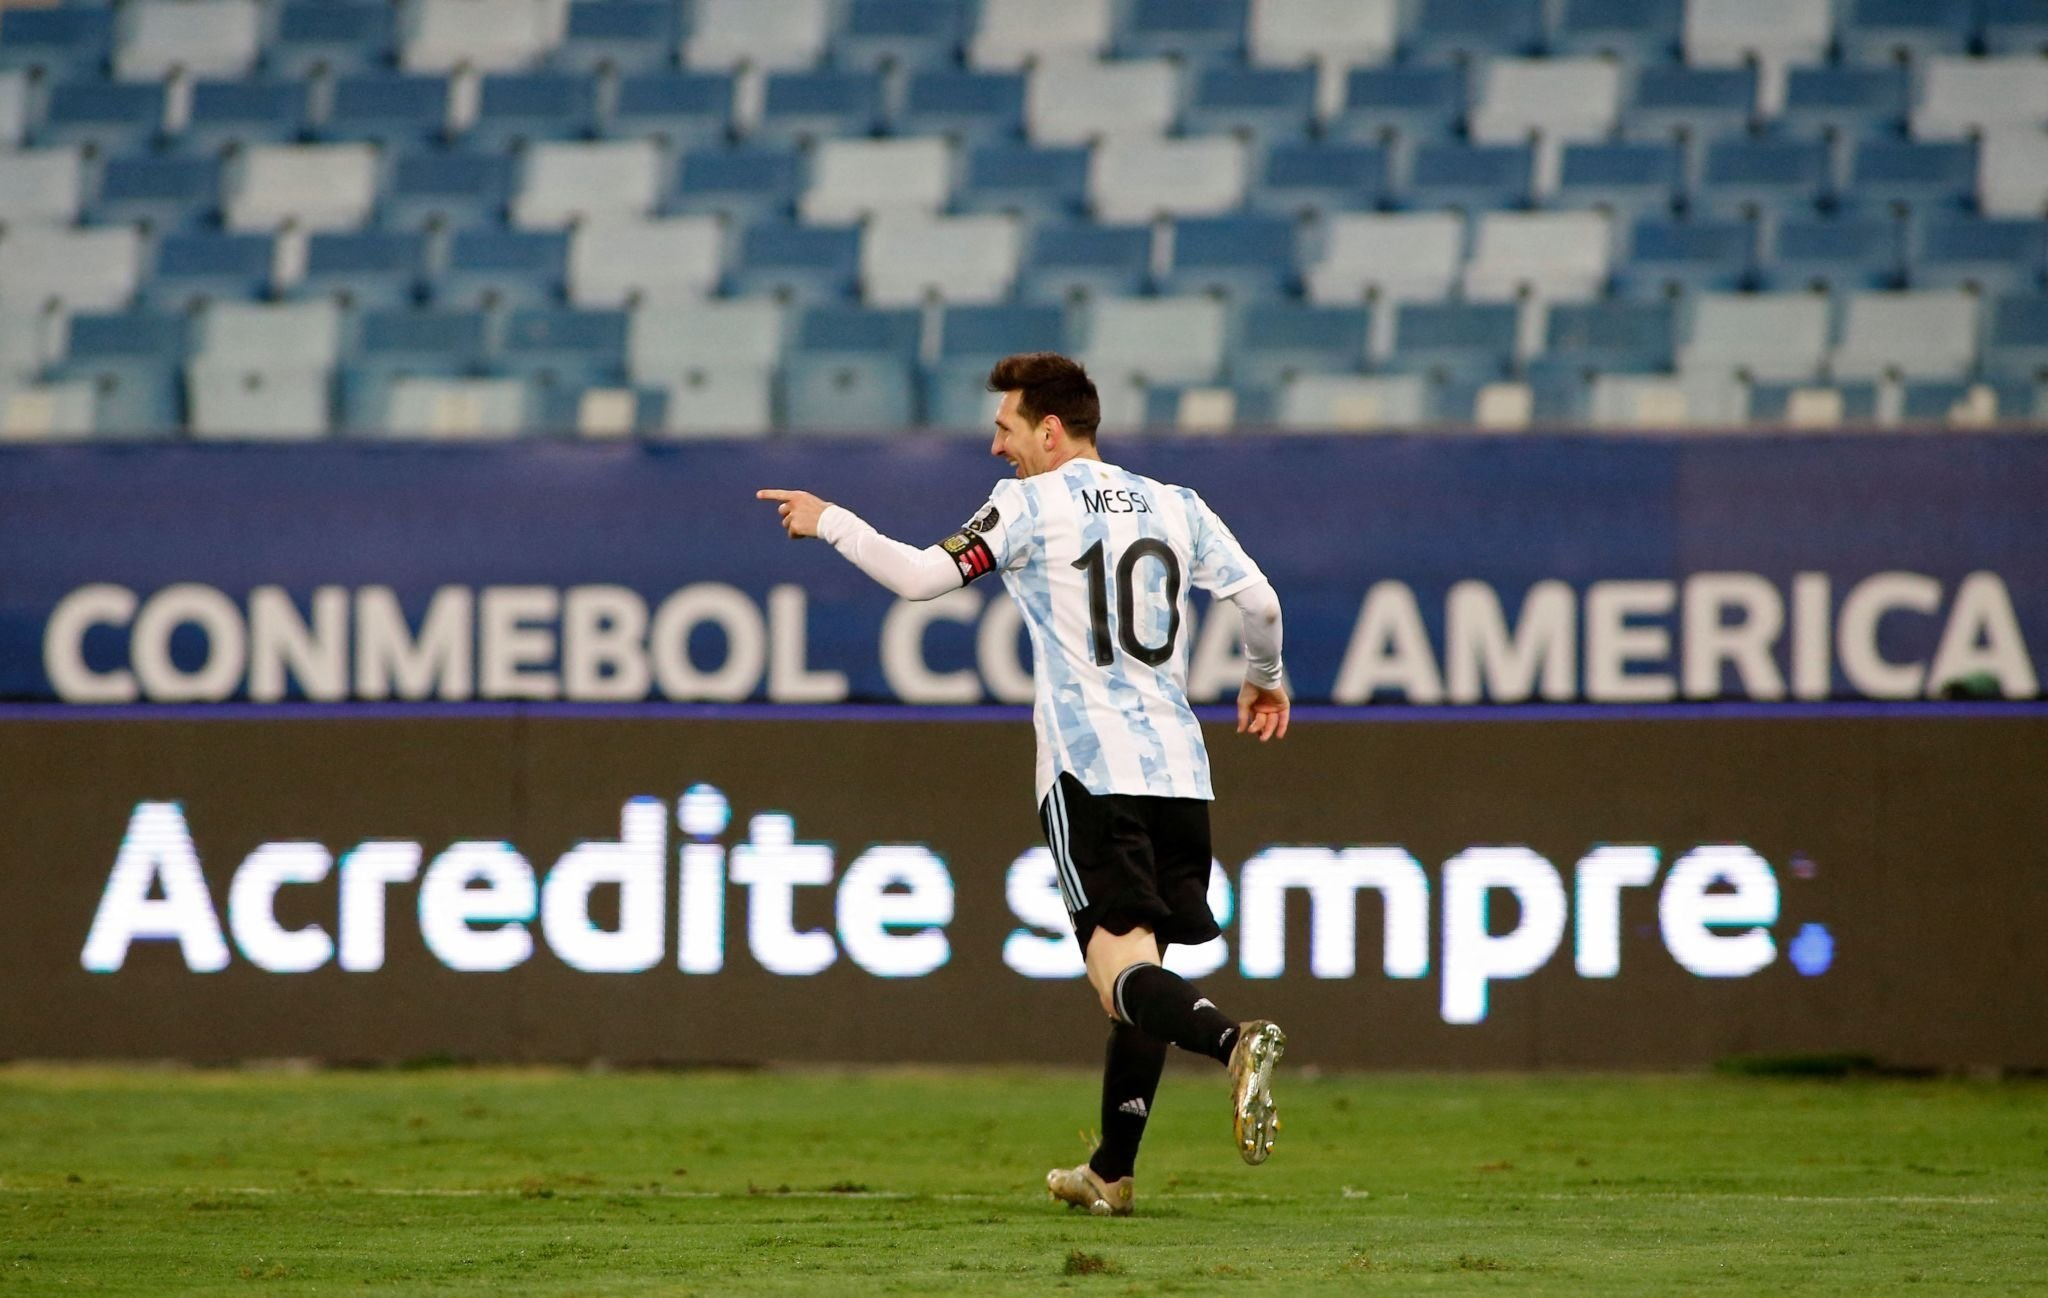 Copa America: Record-Breaking Messi Bags Brace As Argentina Thrash Bolivia 4-1